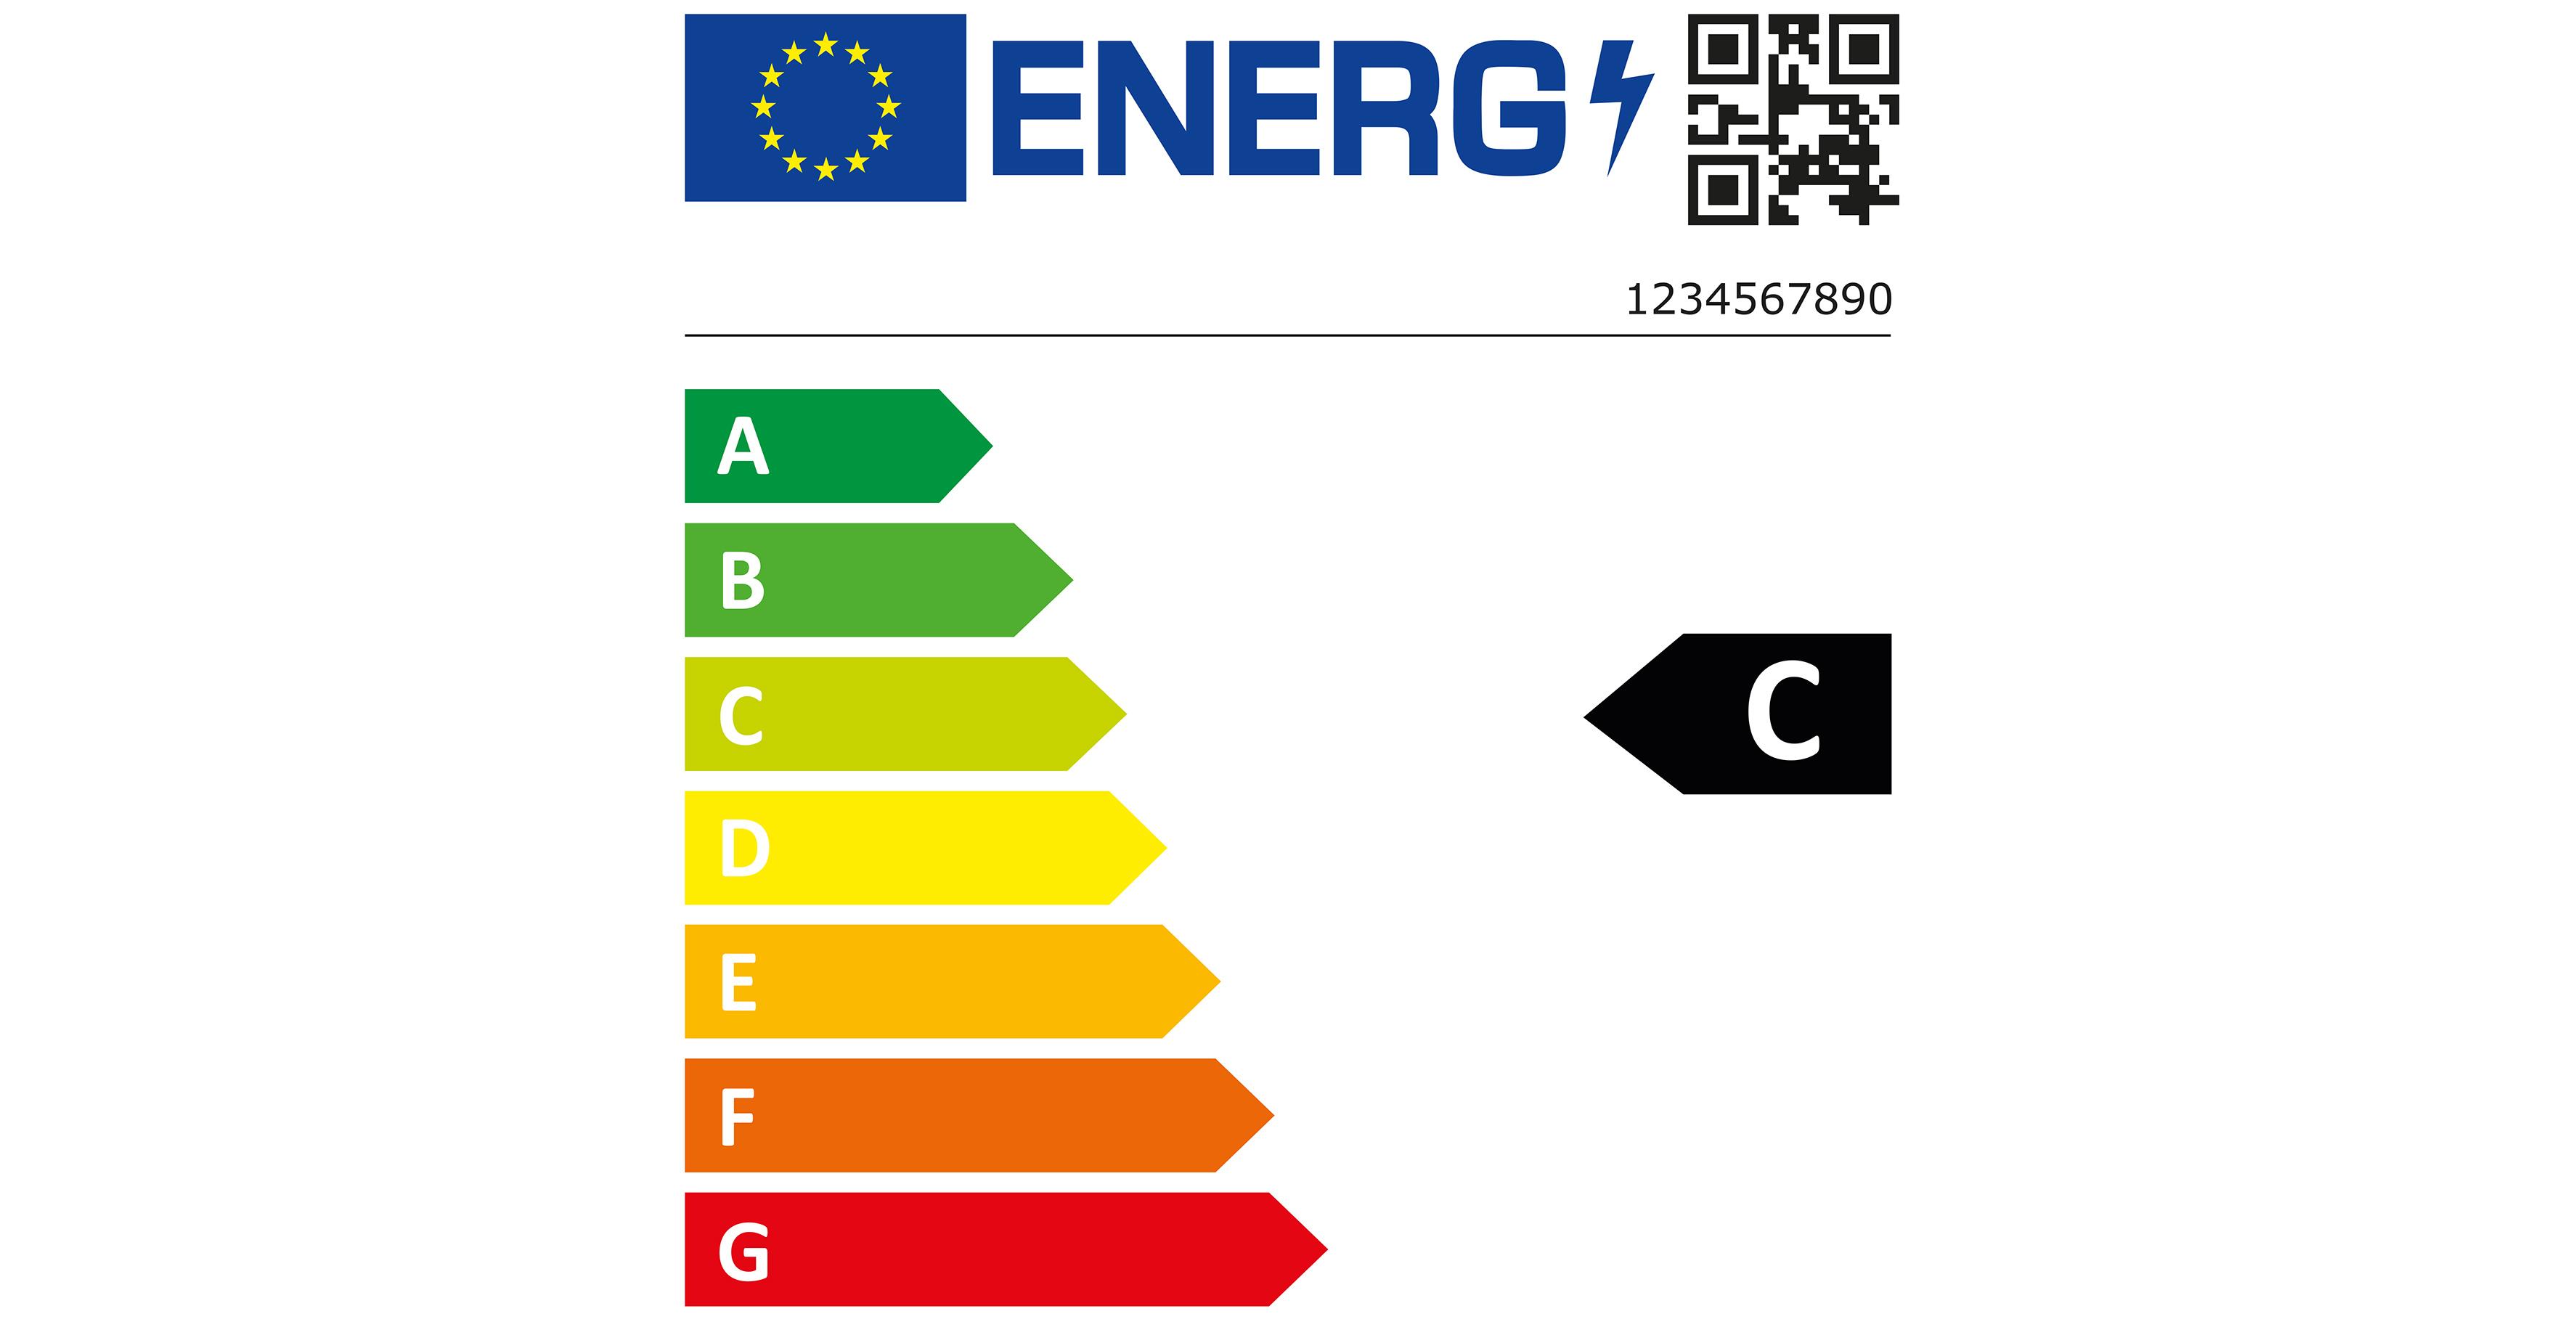 Neues EU-Energielabel 2021